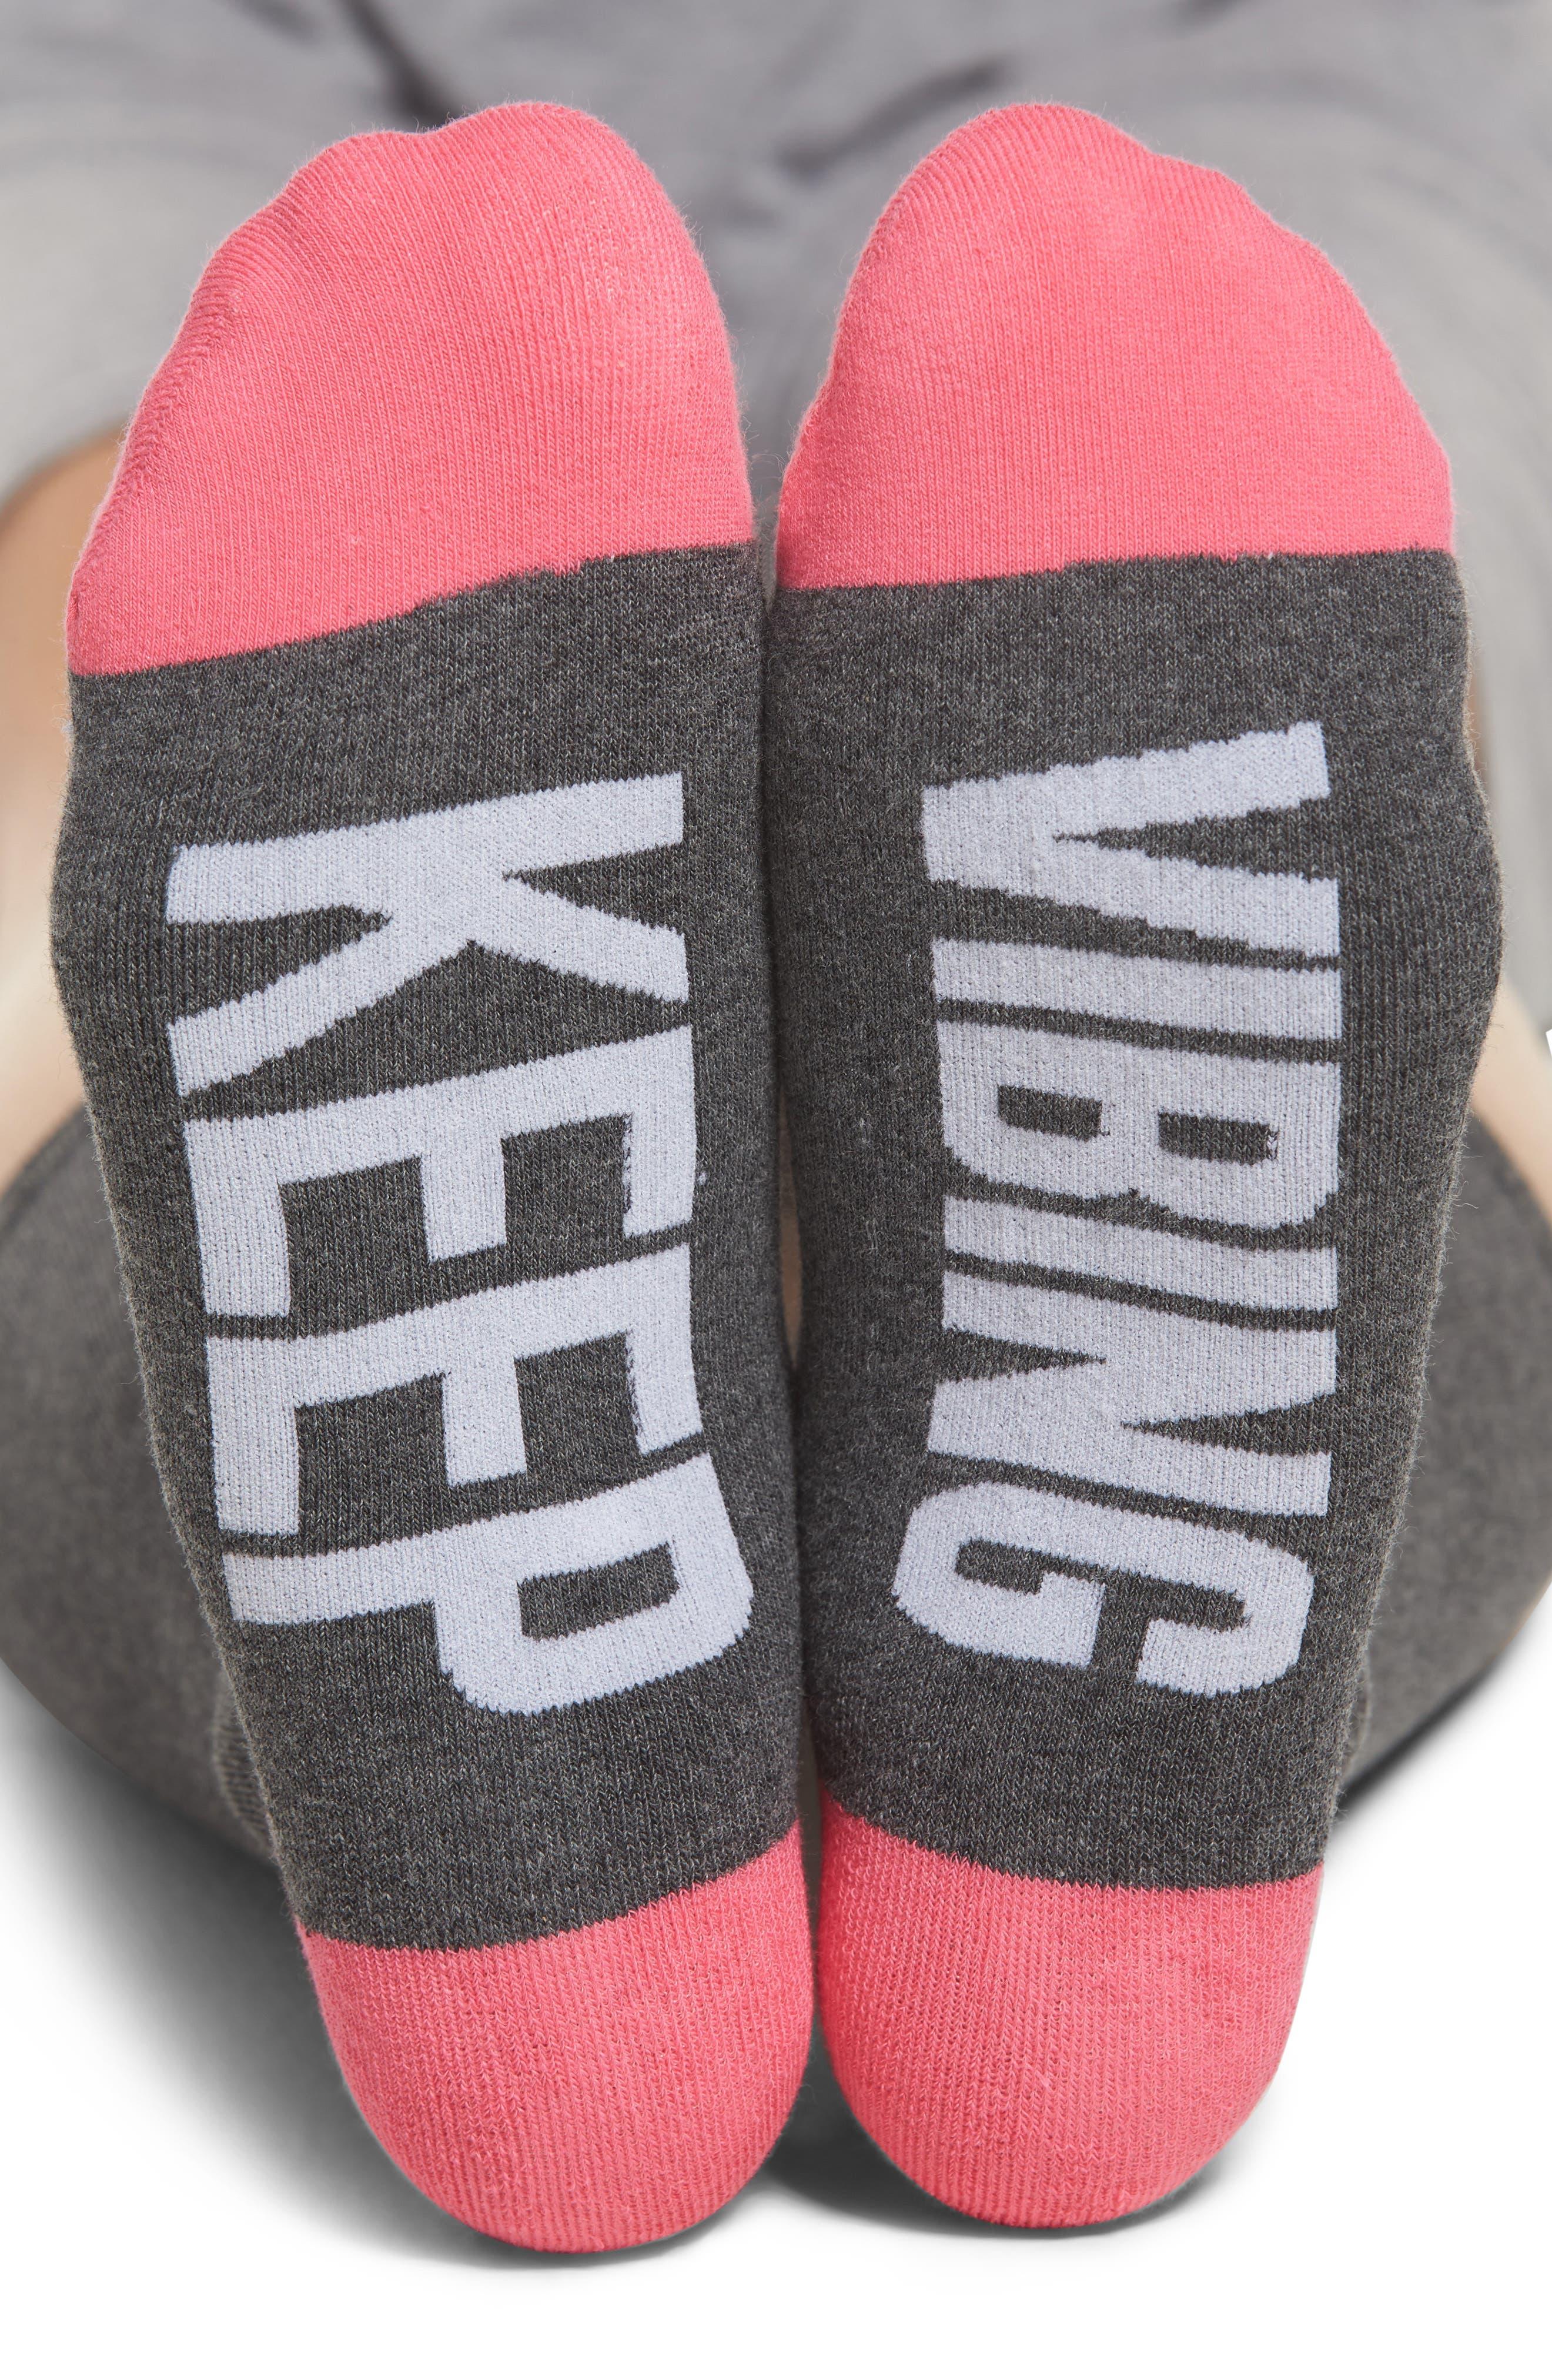 Keep Vibing Crew Socks,                         Main,                         color, Charcoal Heather